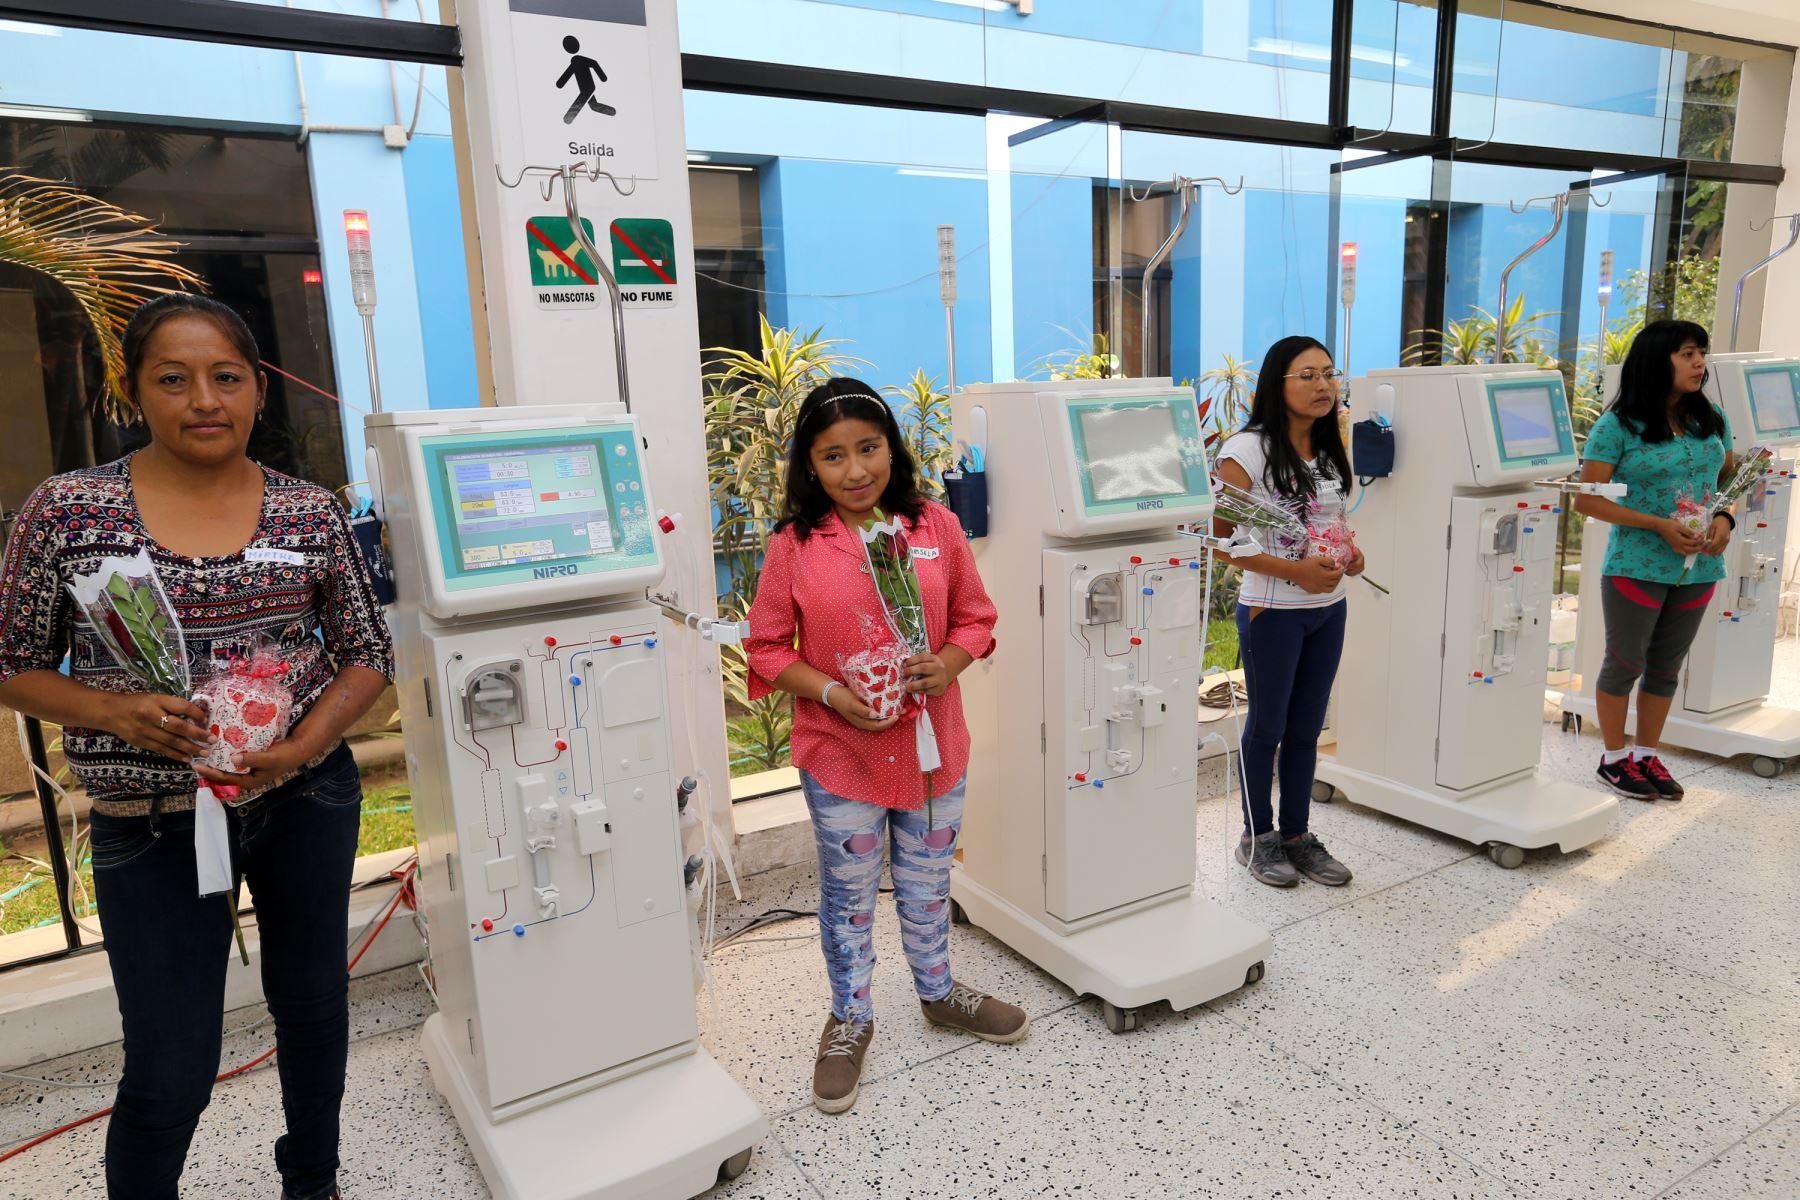 EsSalu presneta modernas máquinas de hemodiálisis. Foto: ANDINA/Norman Córdova